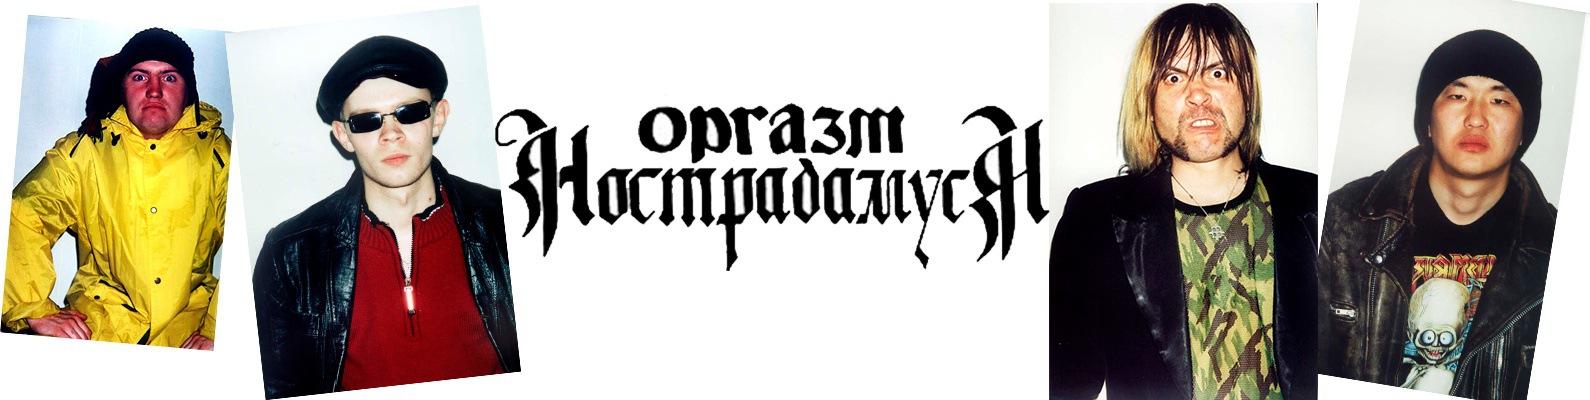 Оргазм нострадамуса аккорды